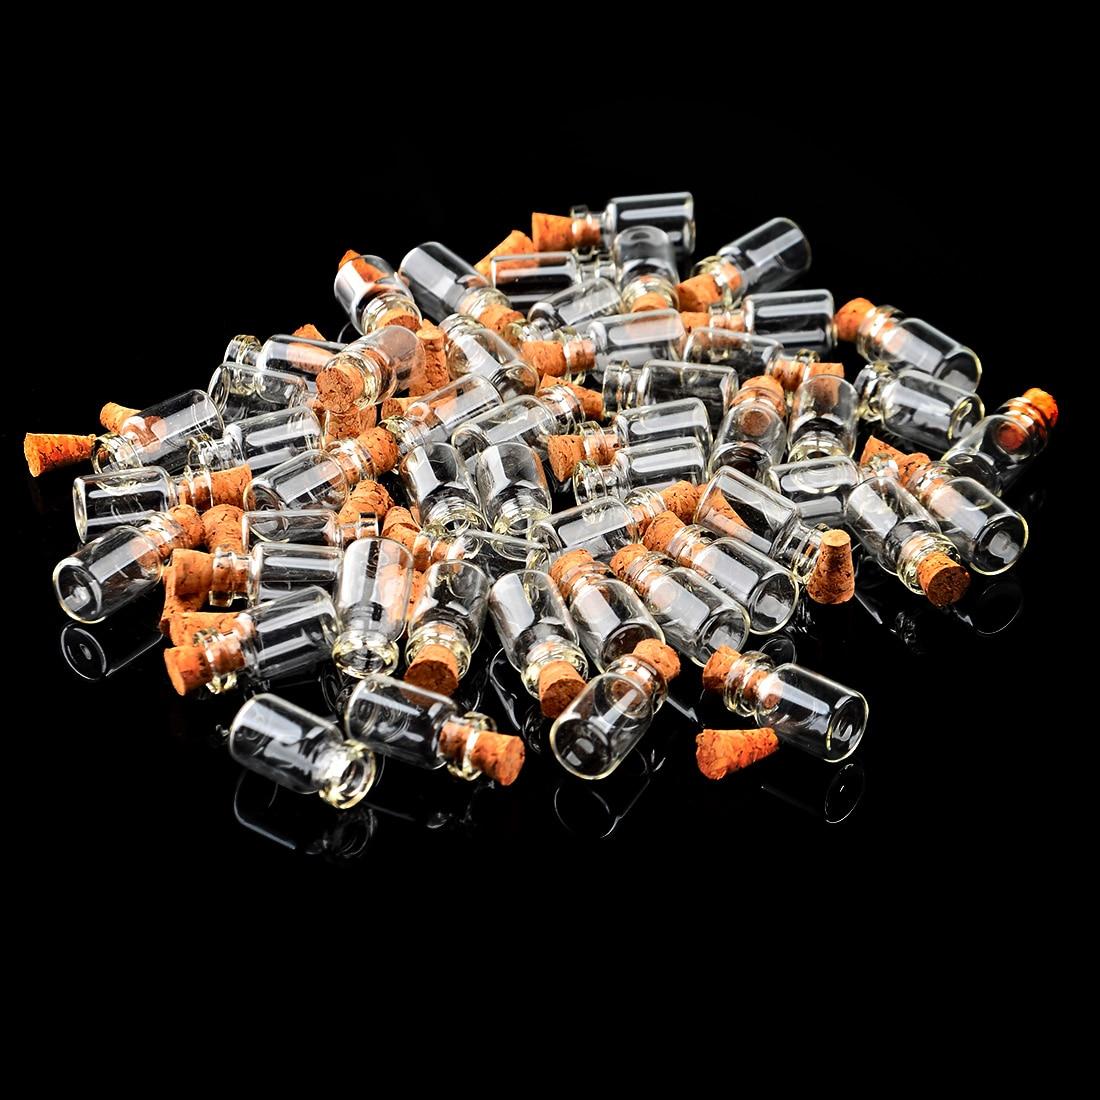 100pcs 0.5ml Mini Clear Glass Bottle Wishing Bottle Vials Empty Jars With Cork Stopper Weddings Wish Jewelry Party Favors New